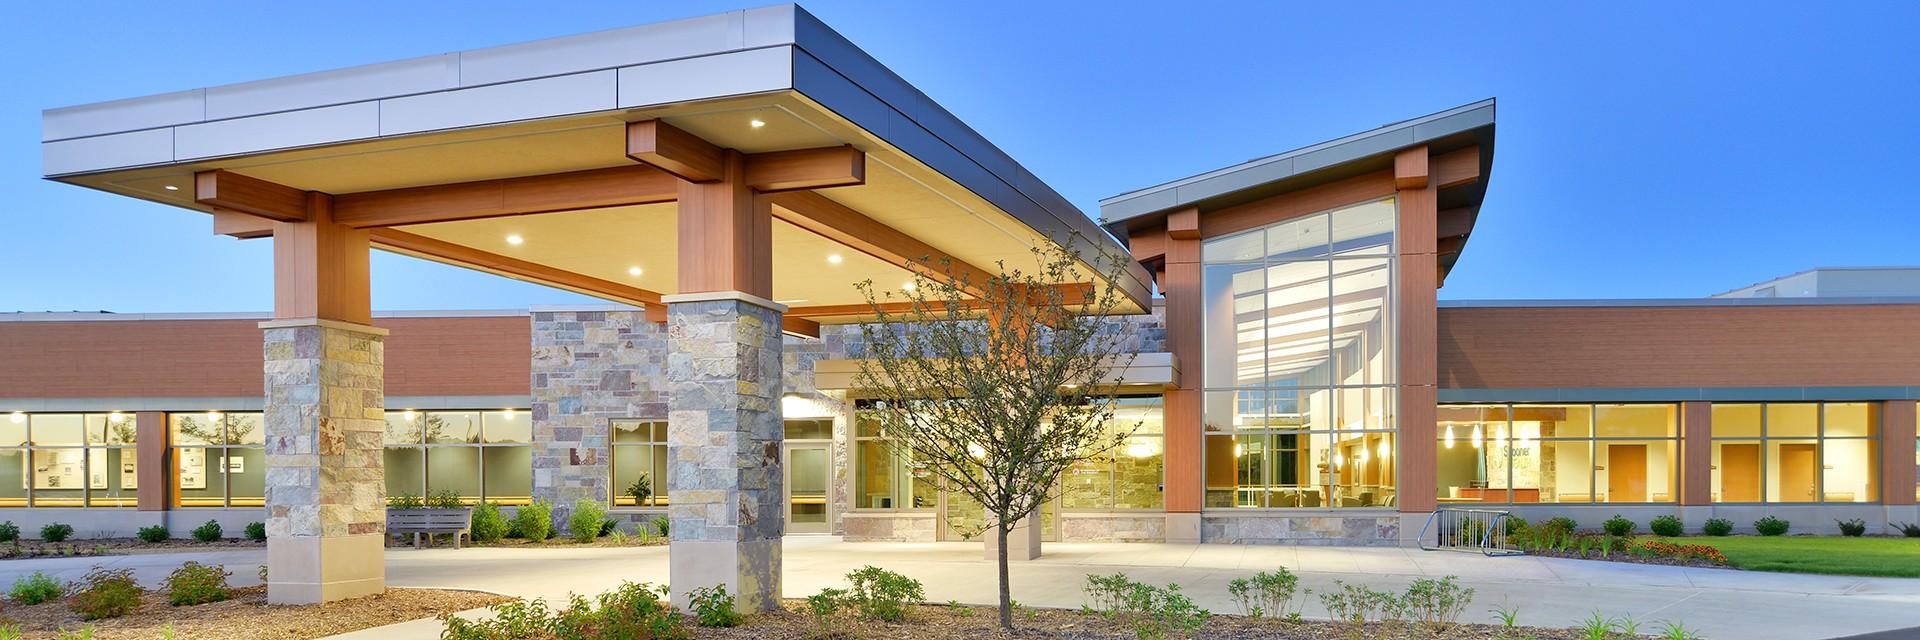 Spooner Health System Hospital